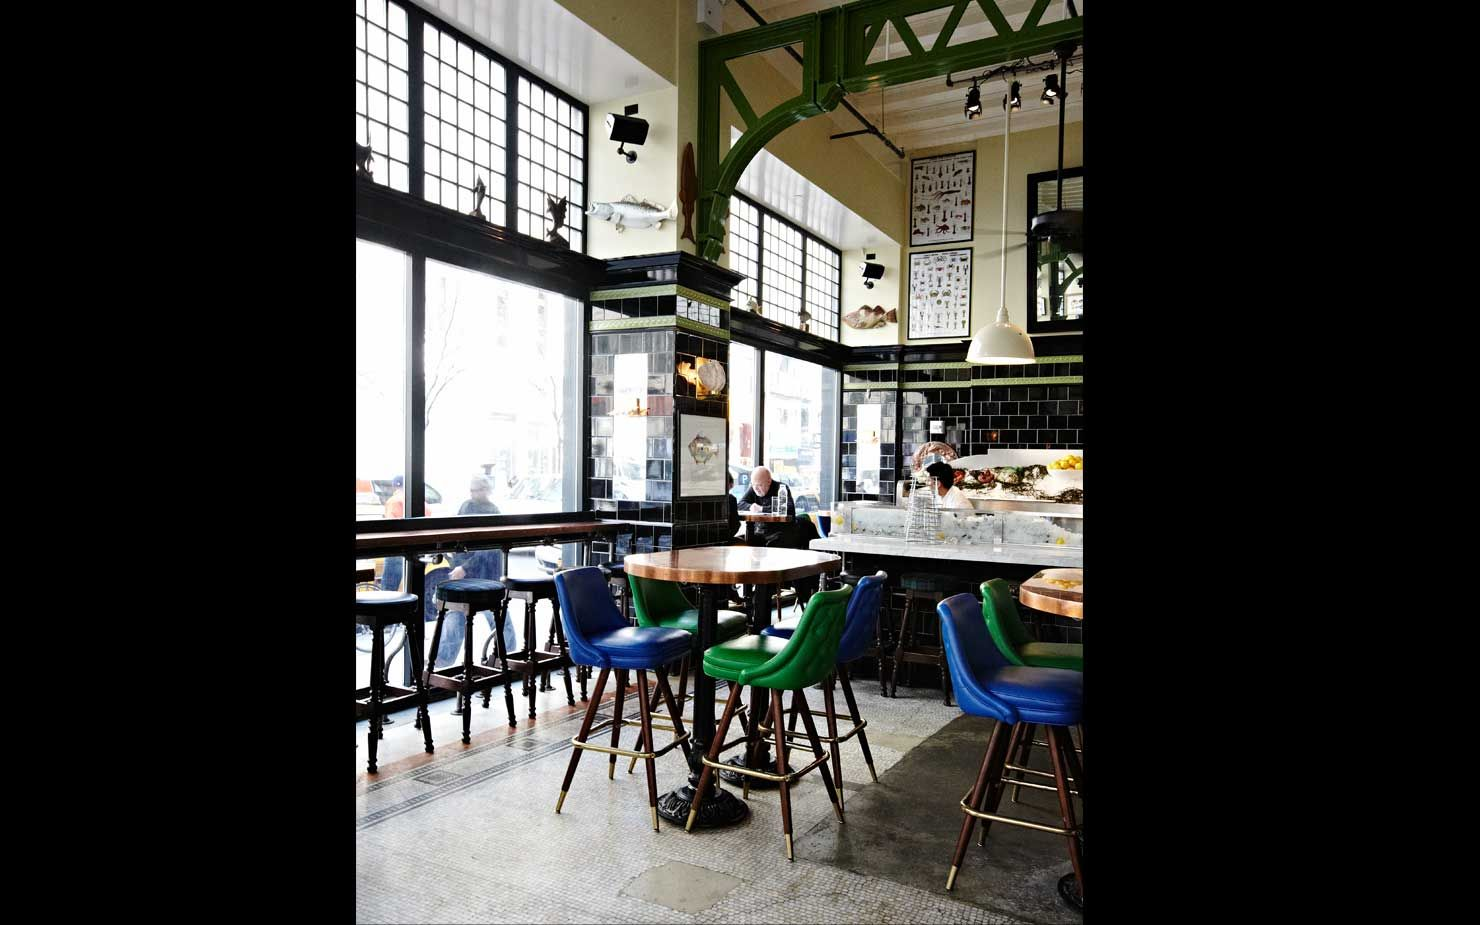 The Standard Ny Http Www Romanandwilliams Com Cafe Bar Interior Bar Interior Design Restaurant Bar Stools